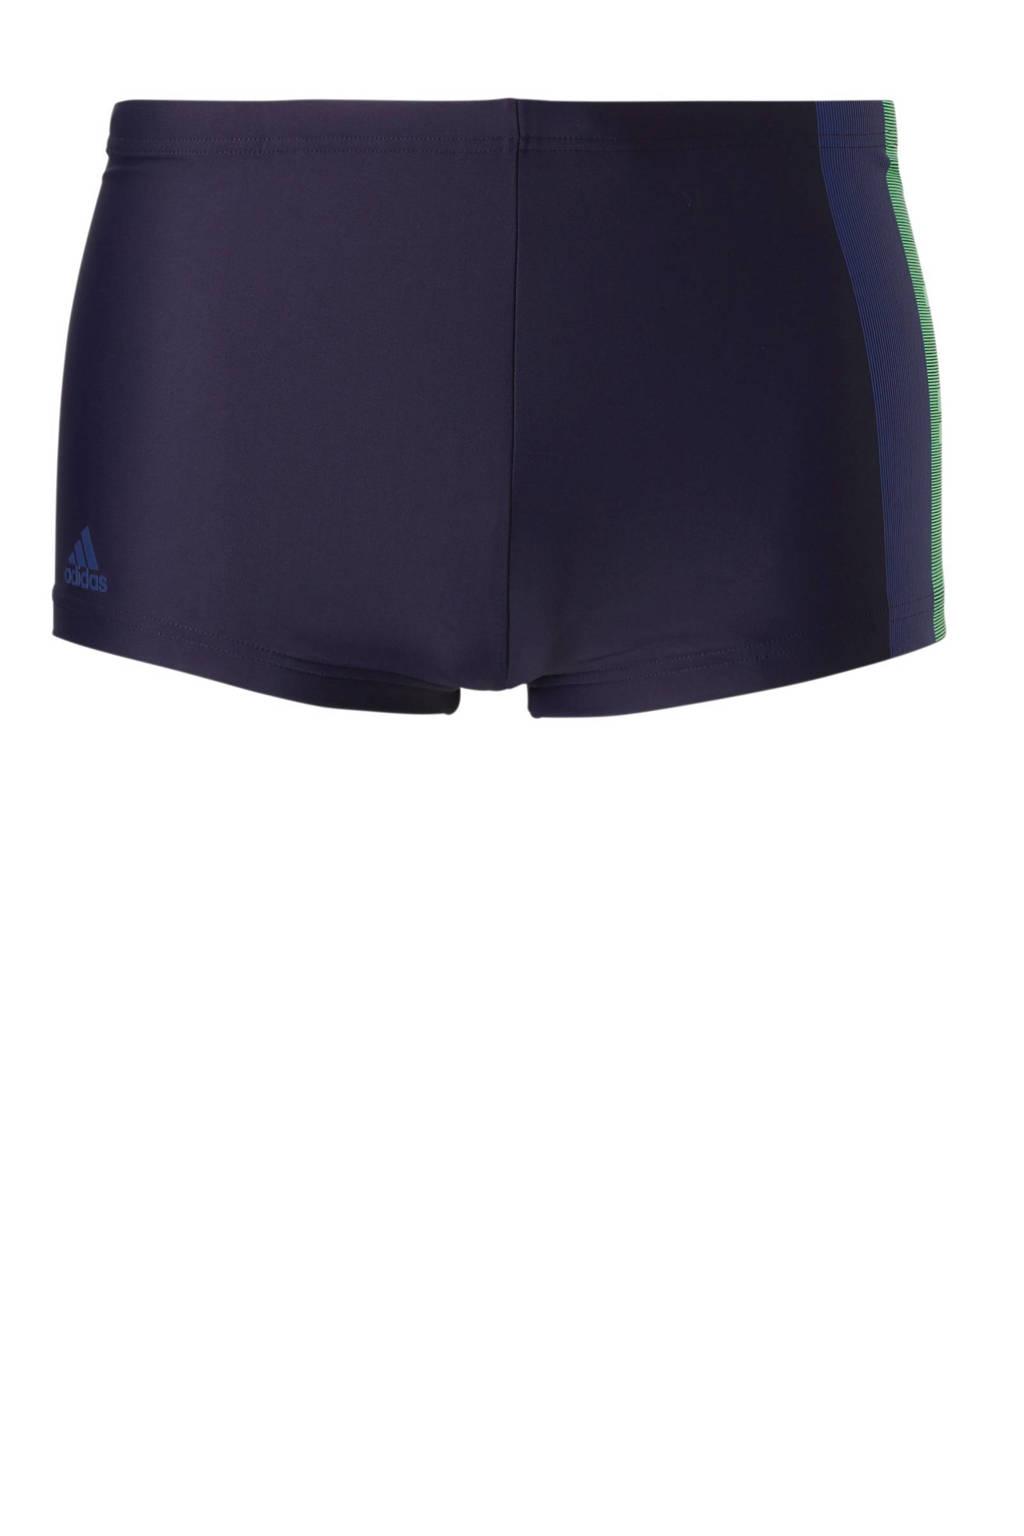 adidas performance infinitex zwemboxer paars/blauw, Paars/blauw/groen